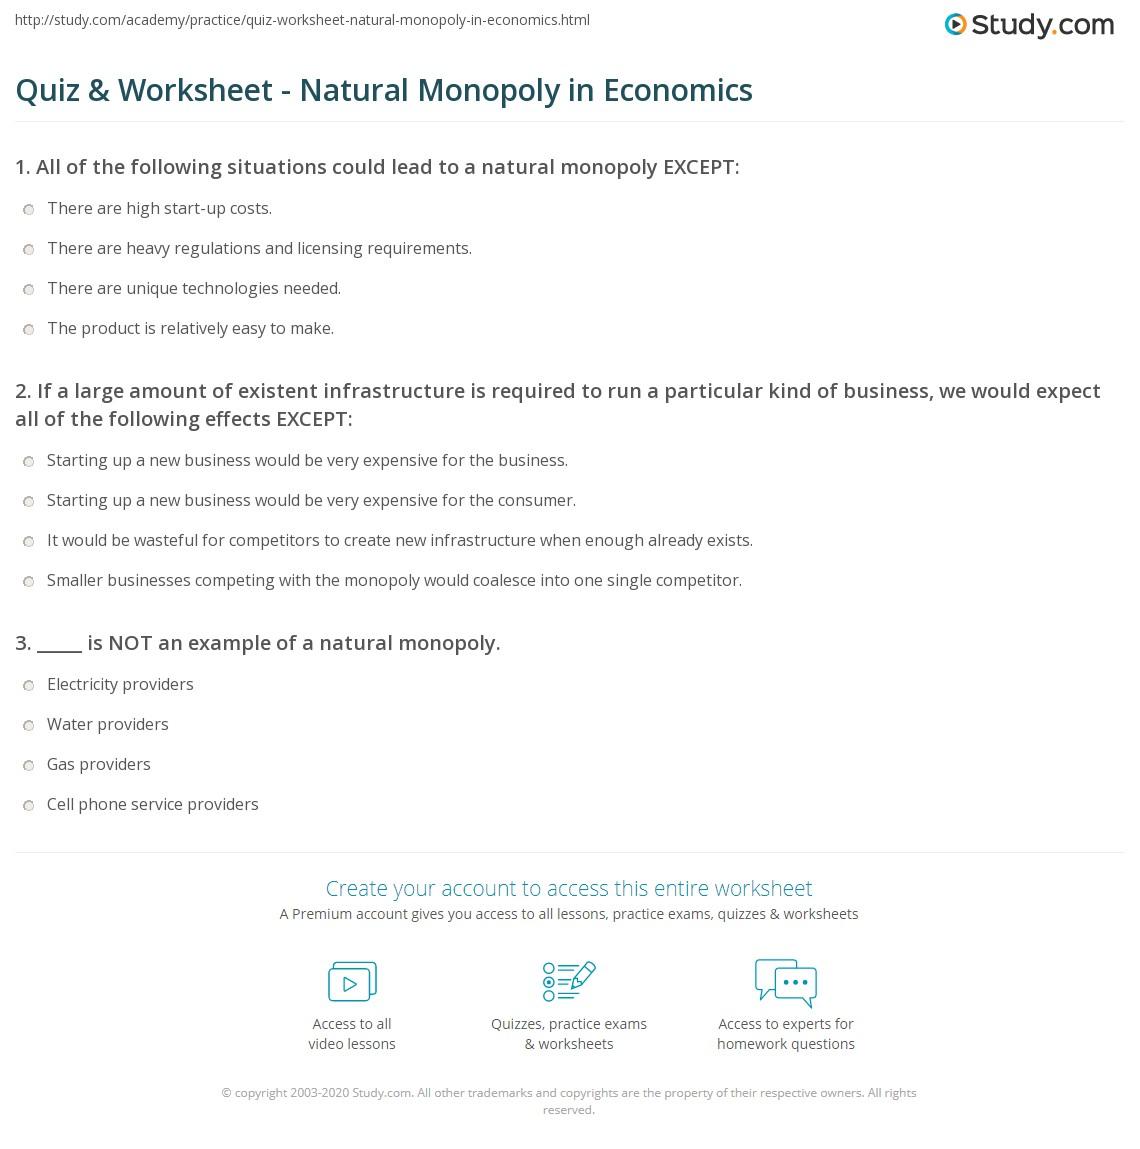 Quiz Worksheet Natural Monopoly In Economics Study